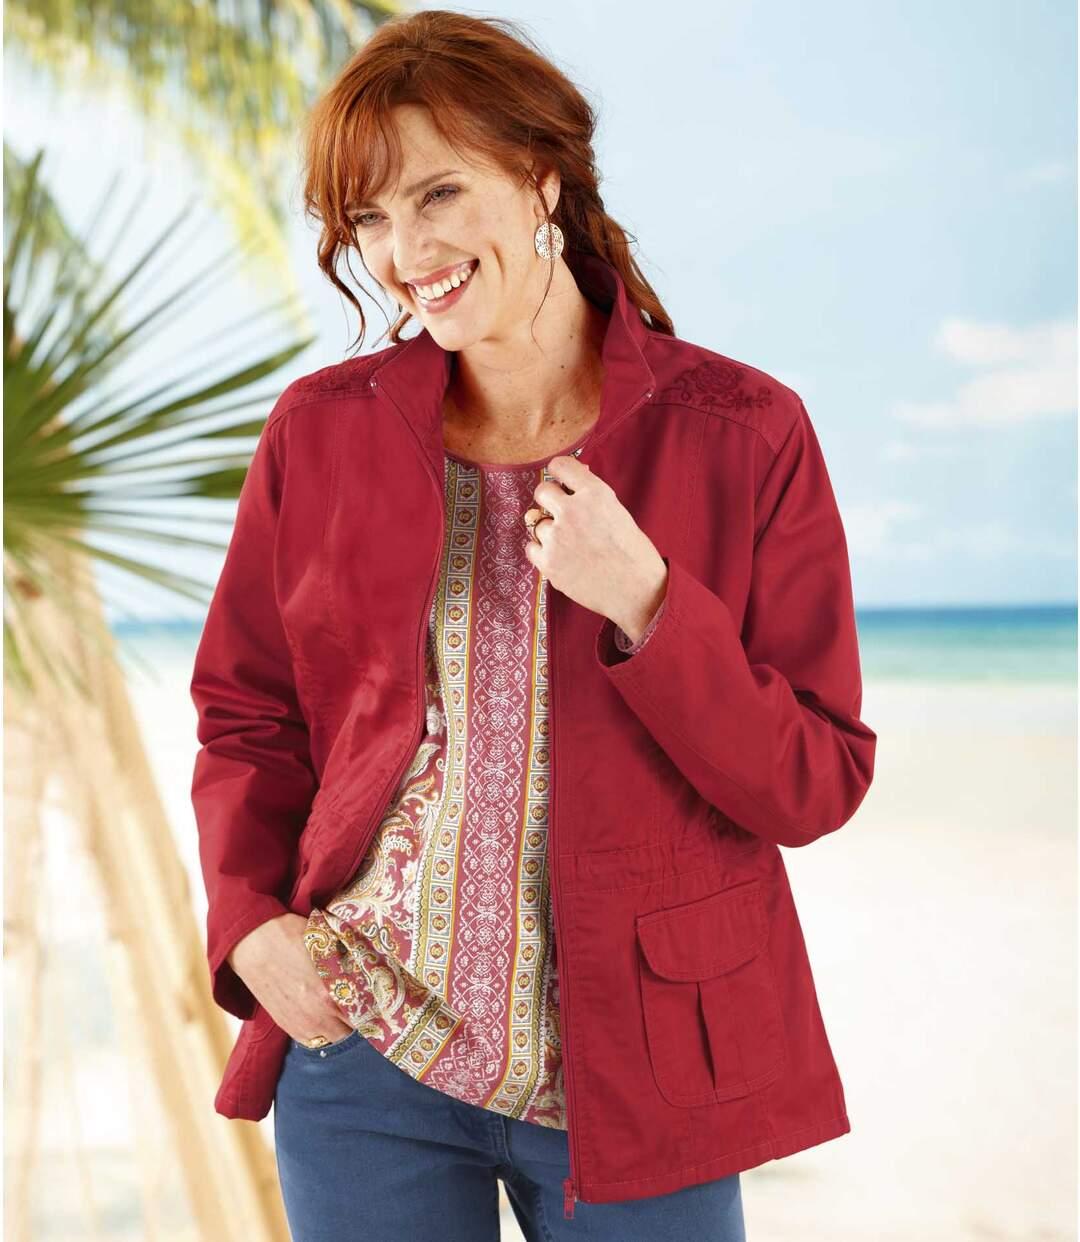 Women's Red Safari Jacket